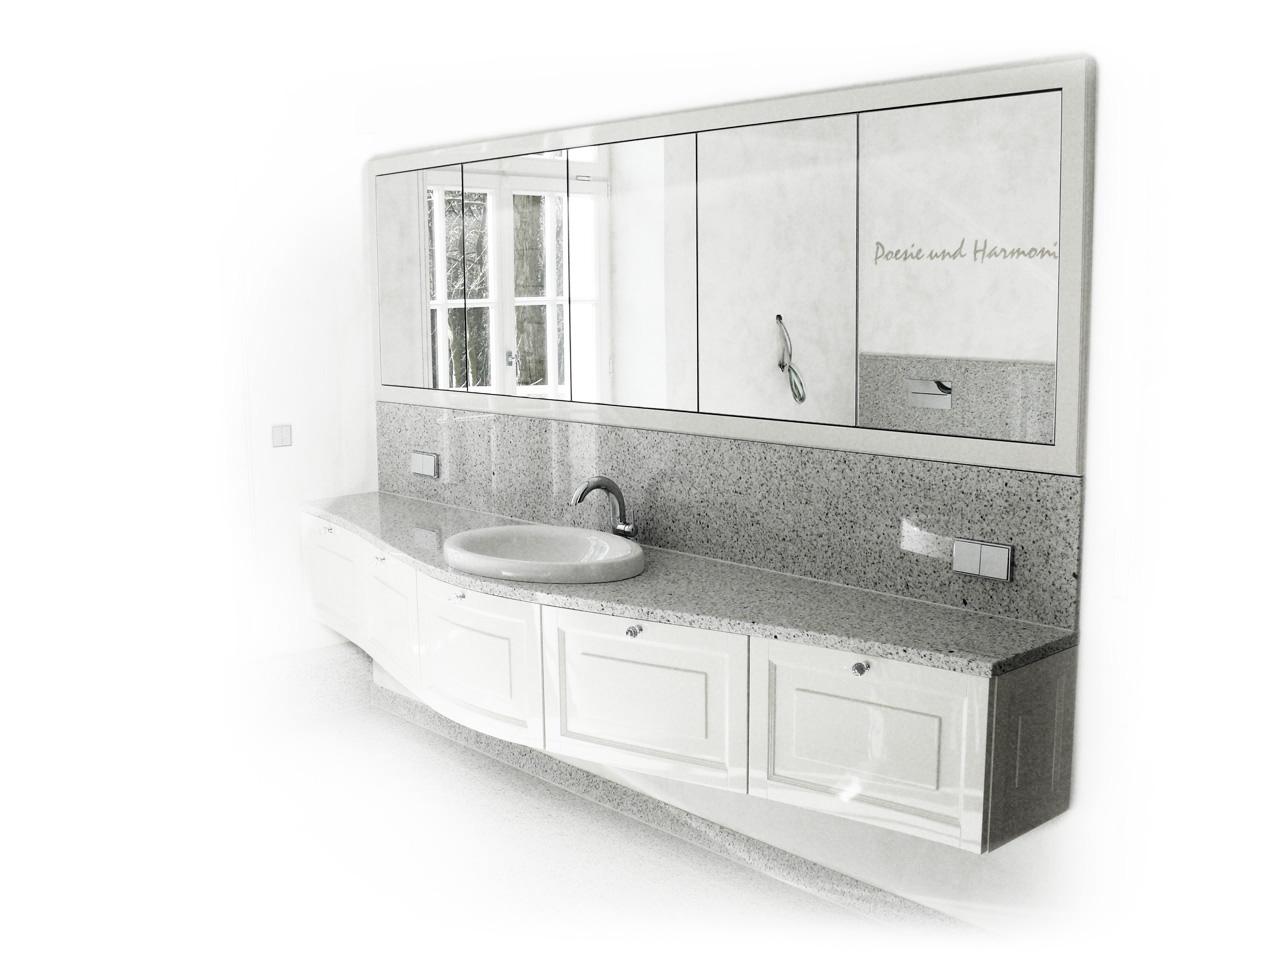 Individuelle Möbel, Möbeldesign